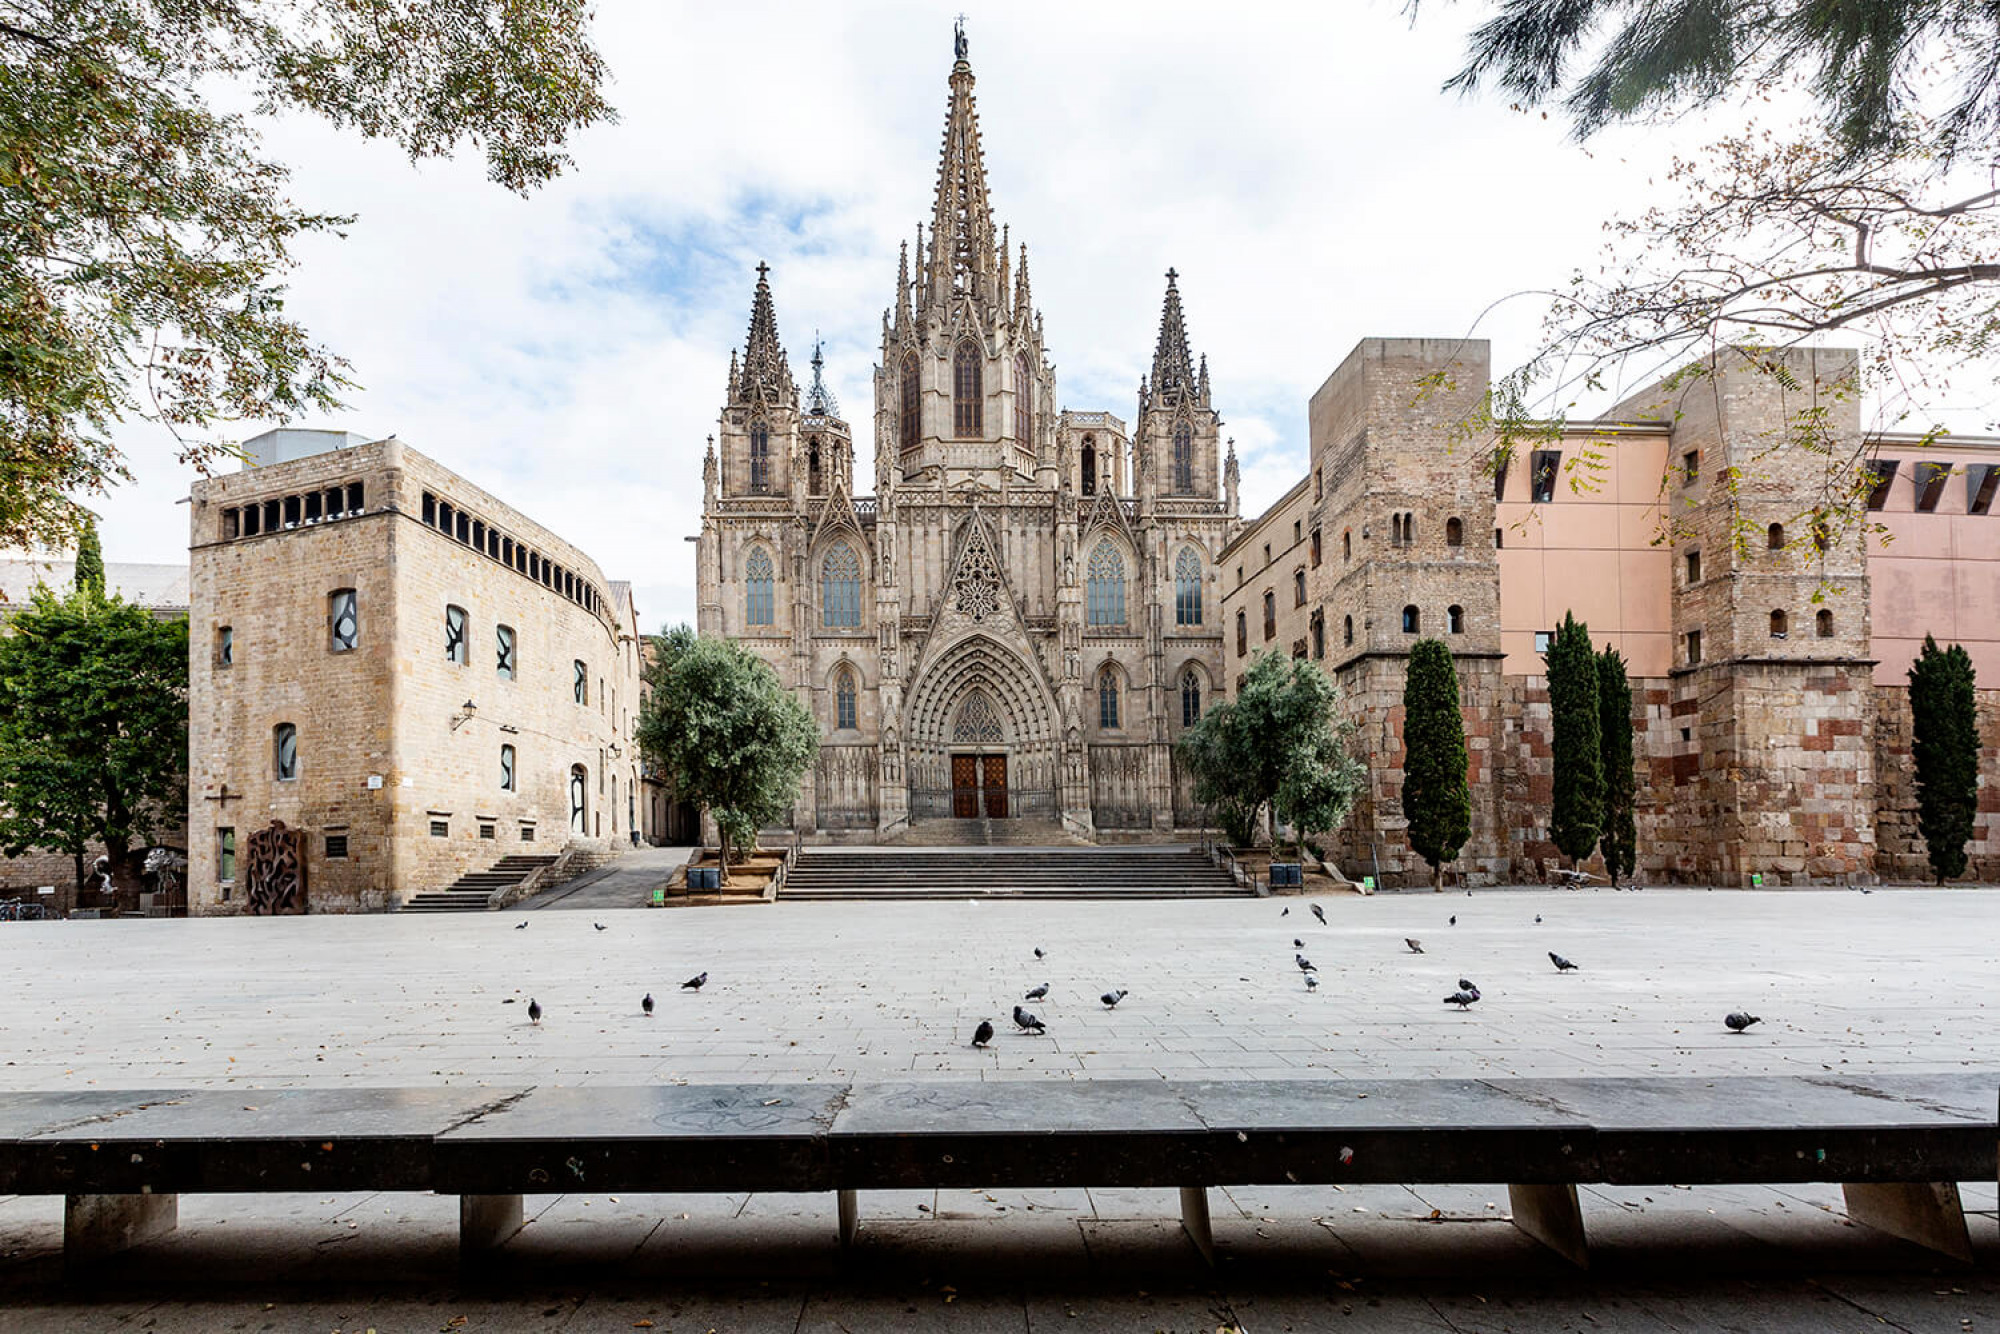 Europa confinada. I Barcelona també ben confinada.